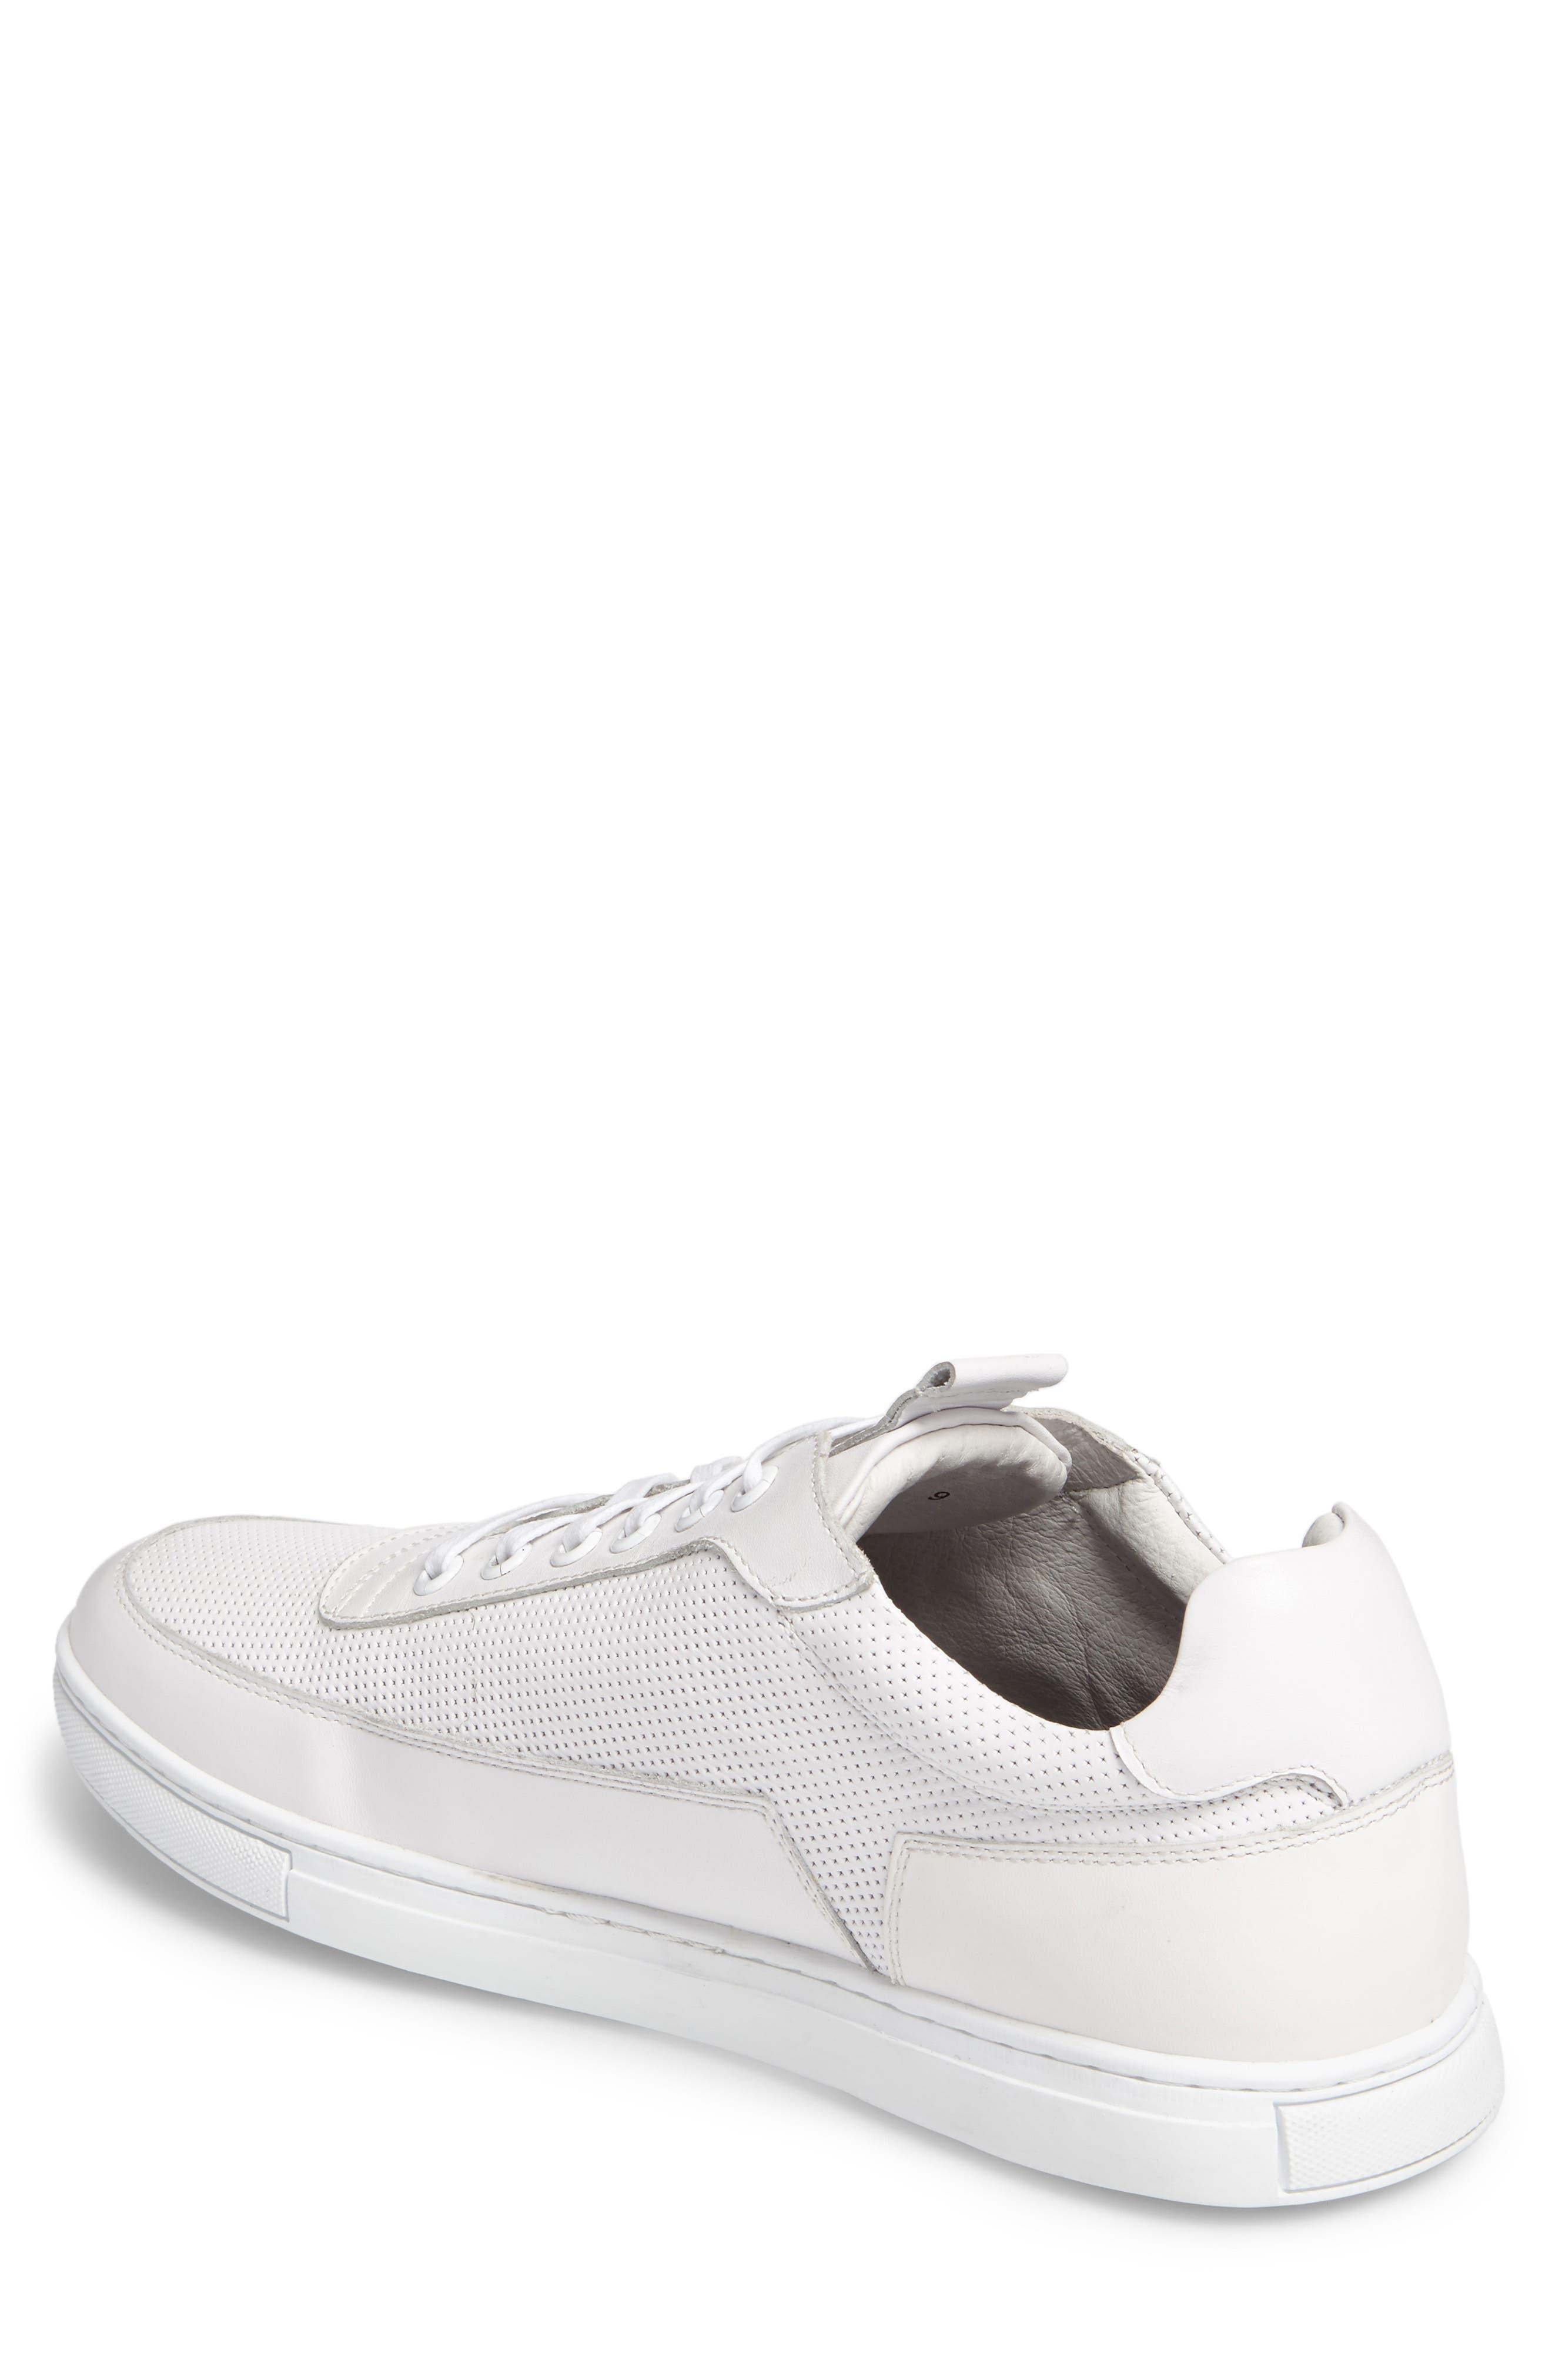 Alternate Image 2  - Zanzara Harmony Sneaker (Men)